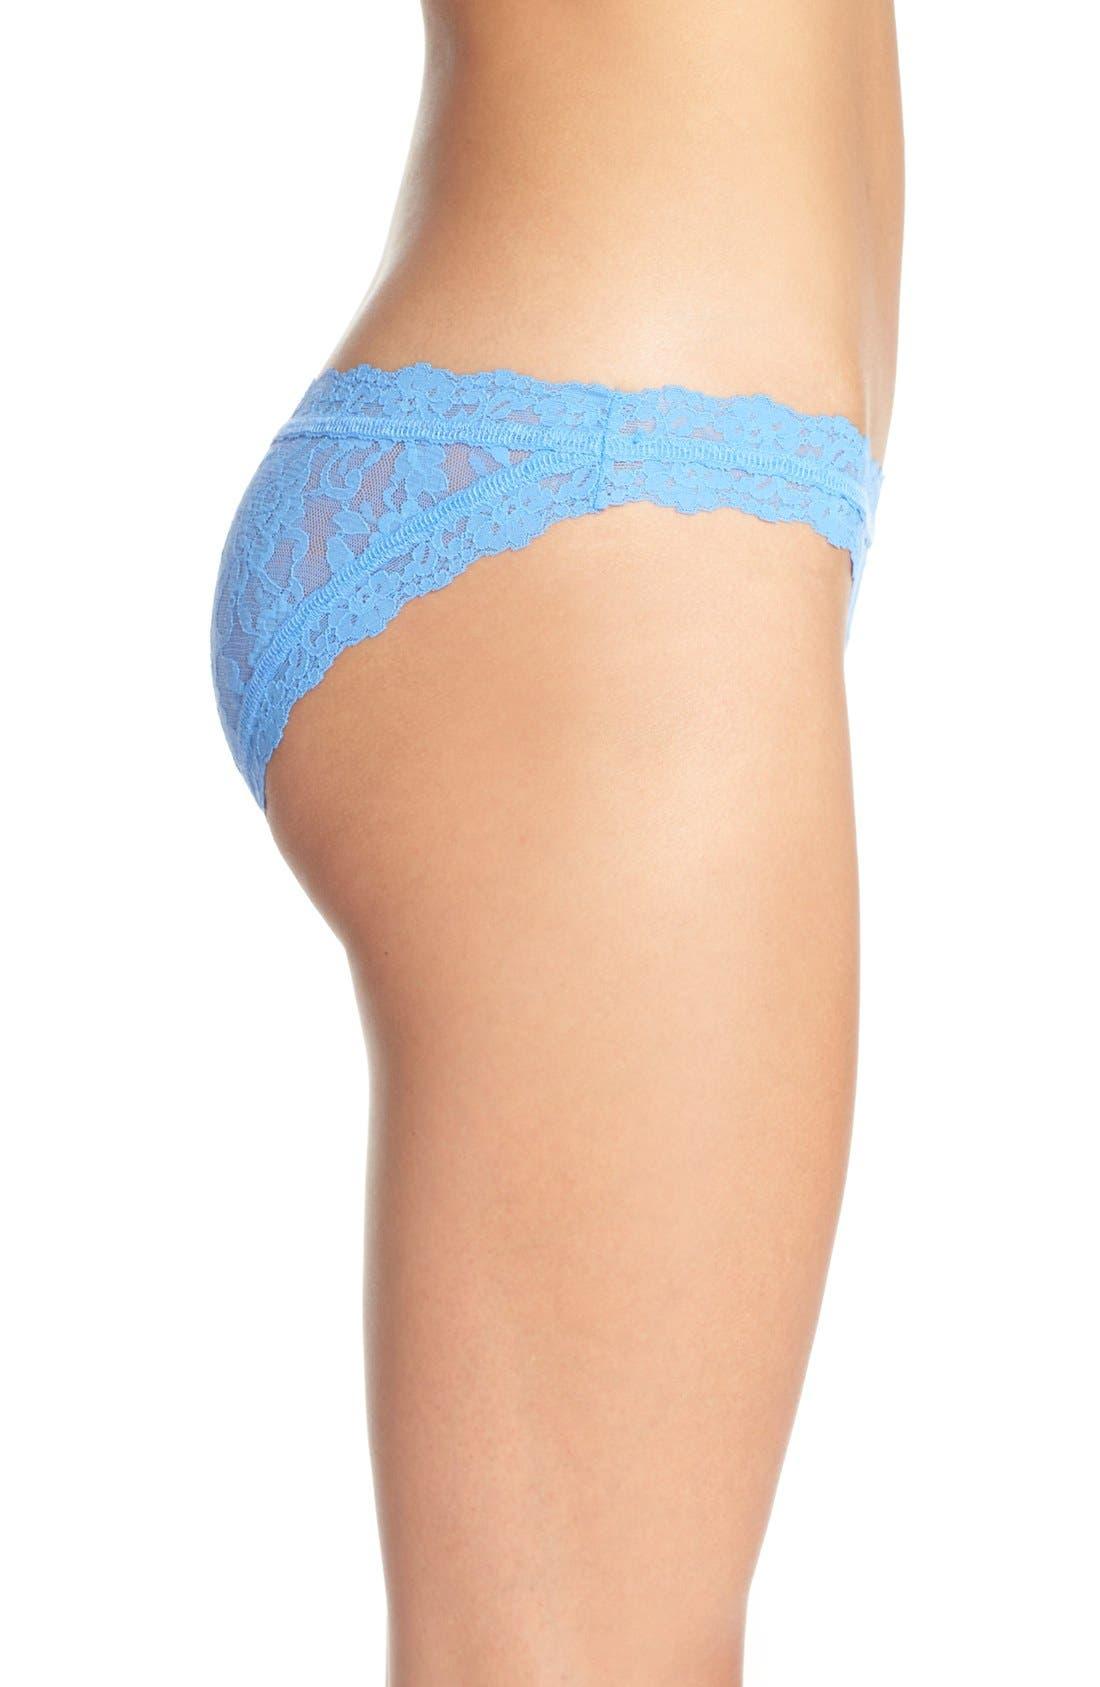 'Signature Lace' Brazilian Bikini,                             Alternate thumbnail 108, color,